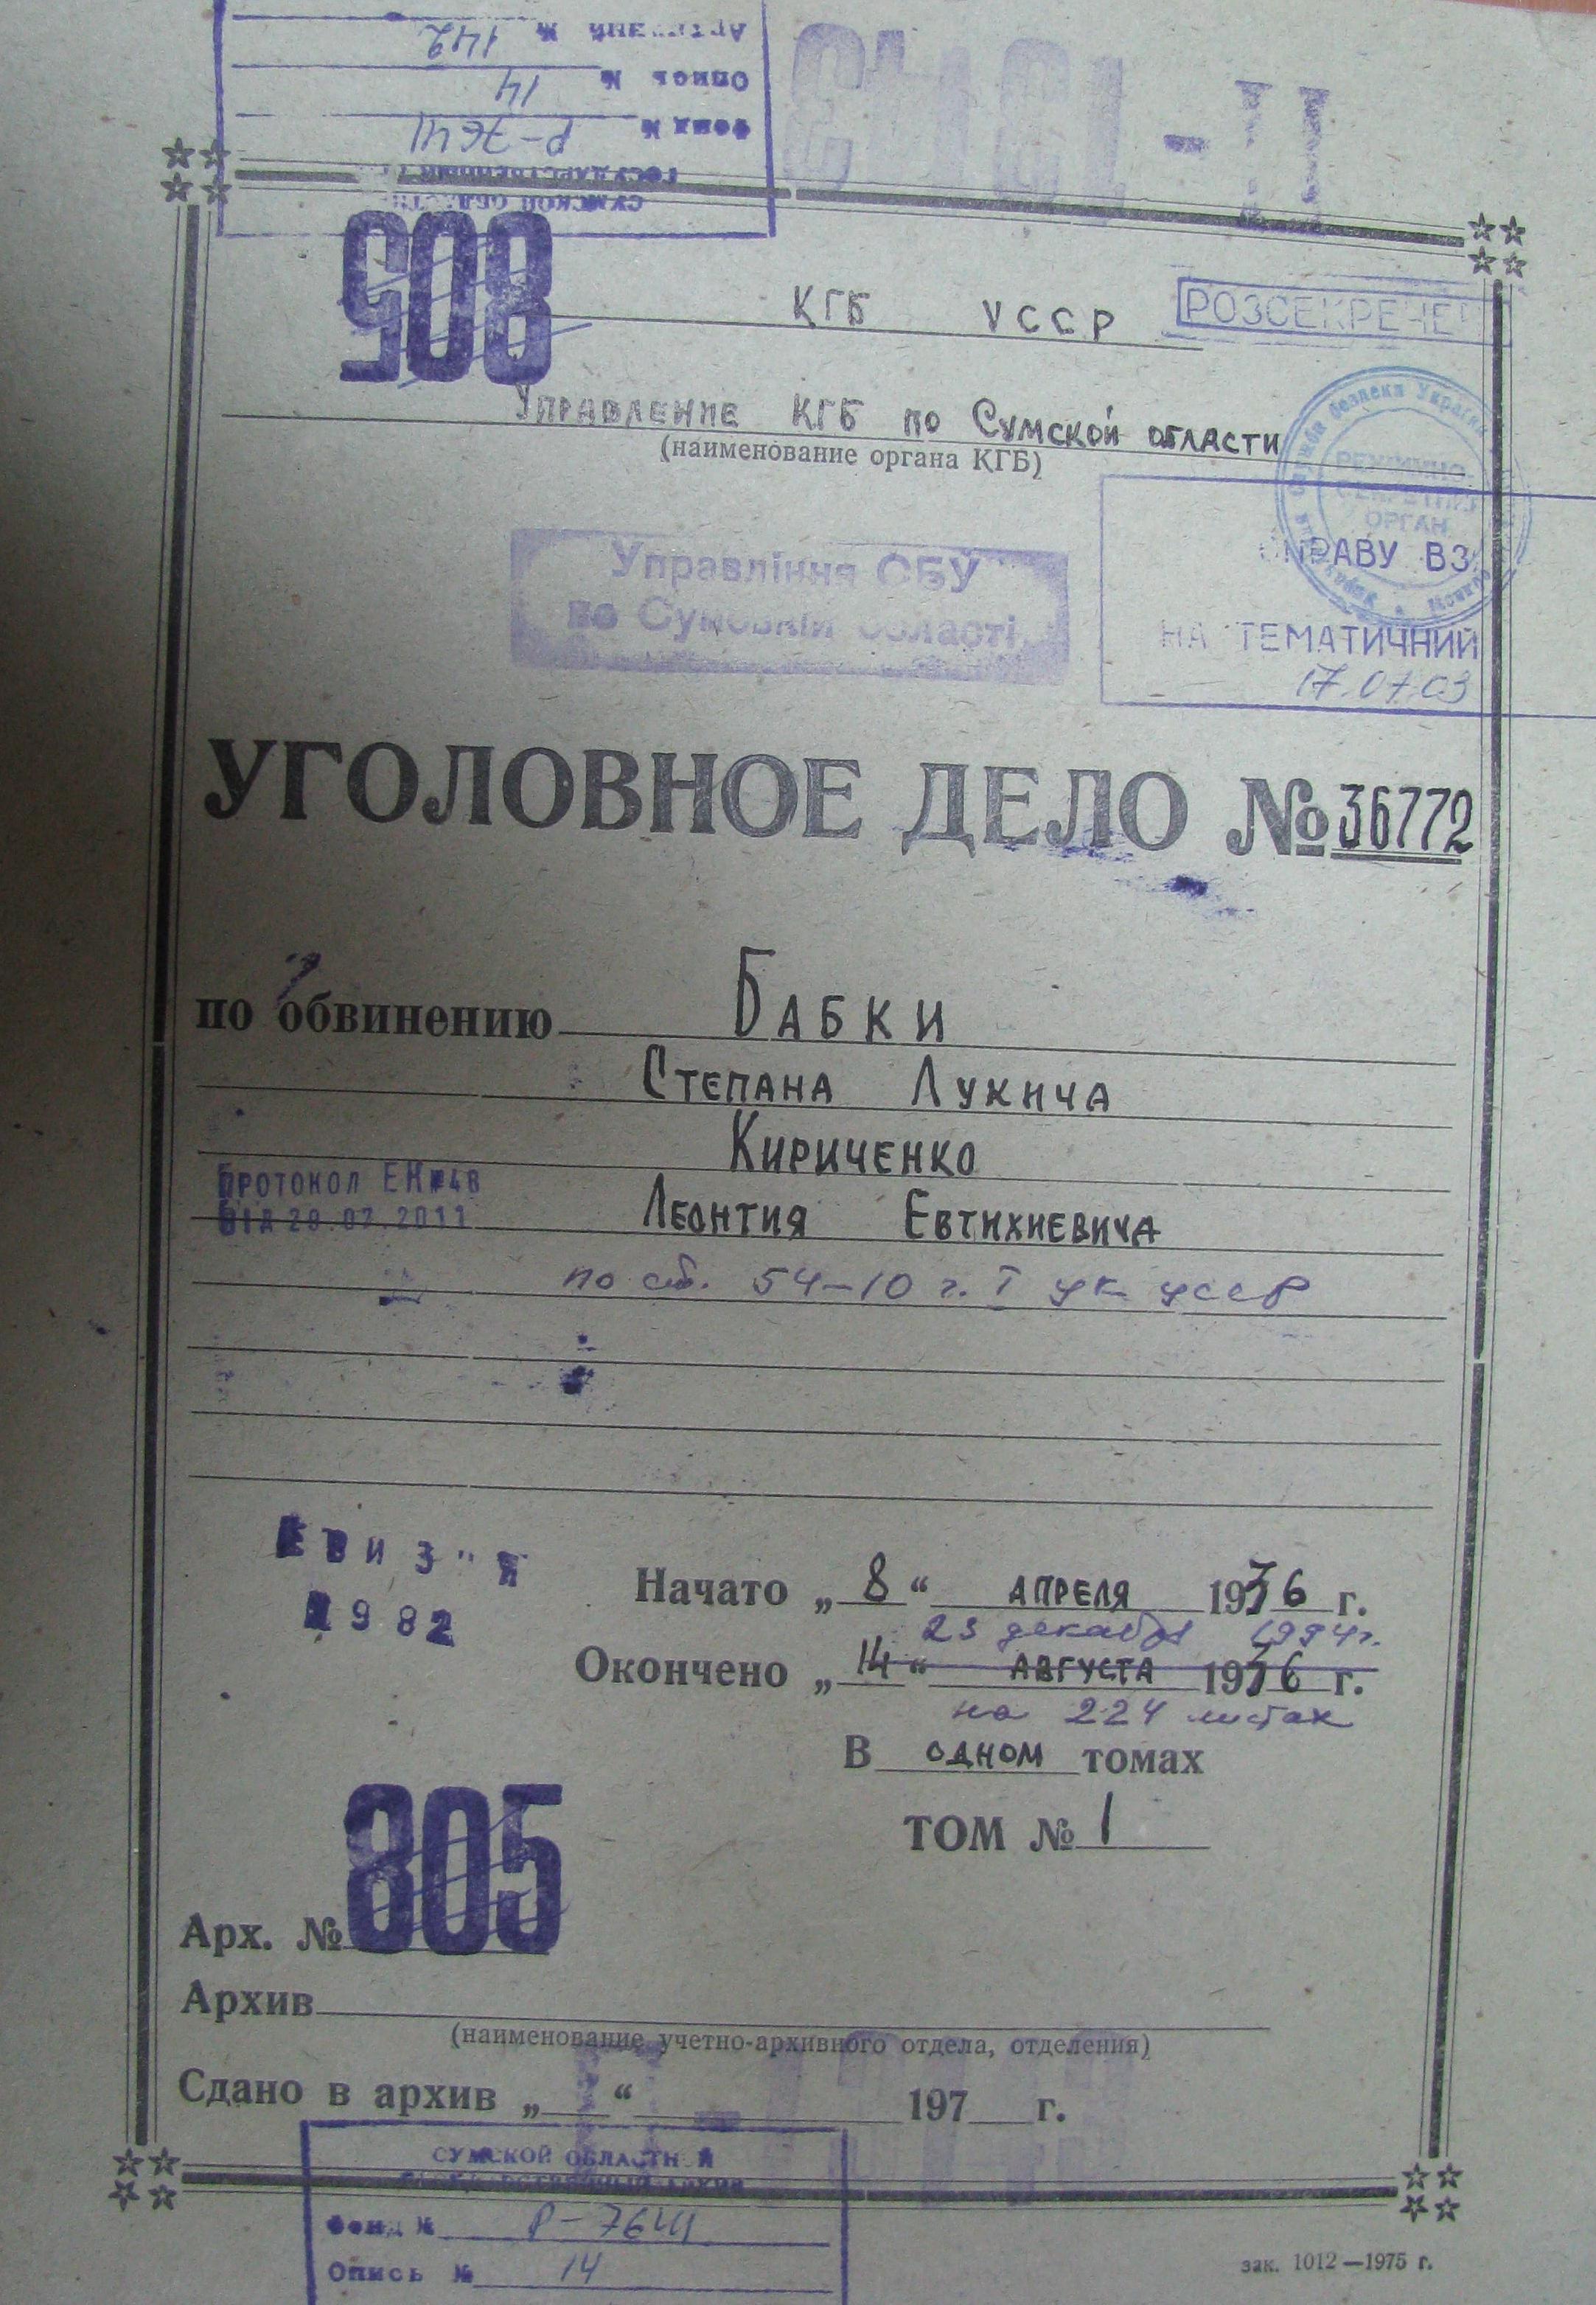 бабка кириченко